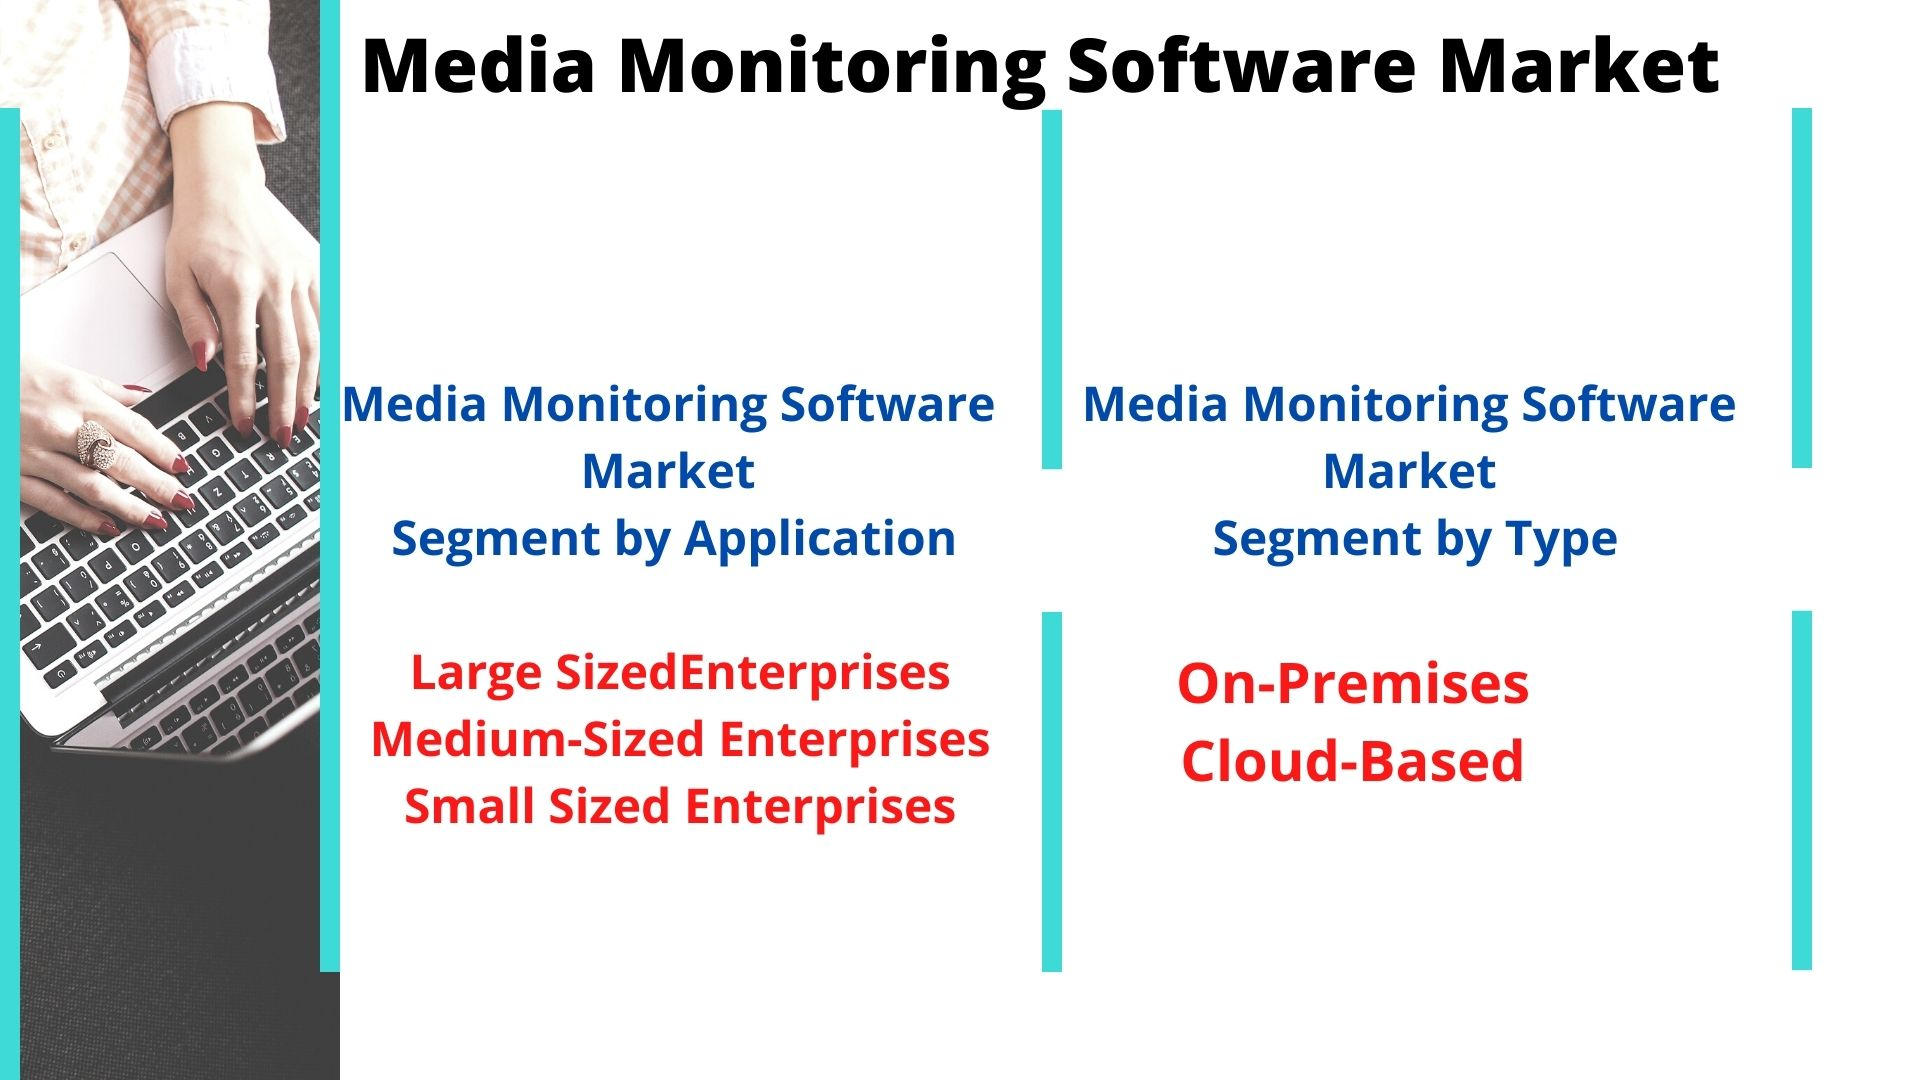 Media Monitoring Software Market